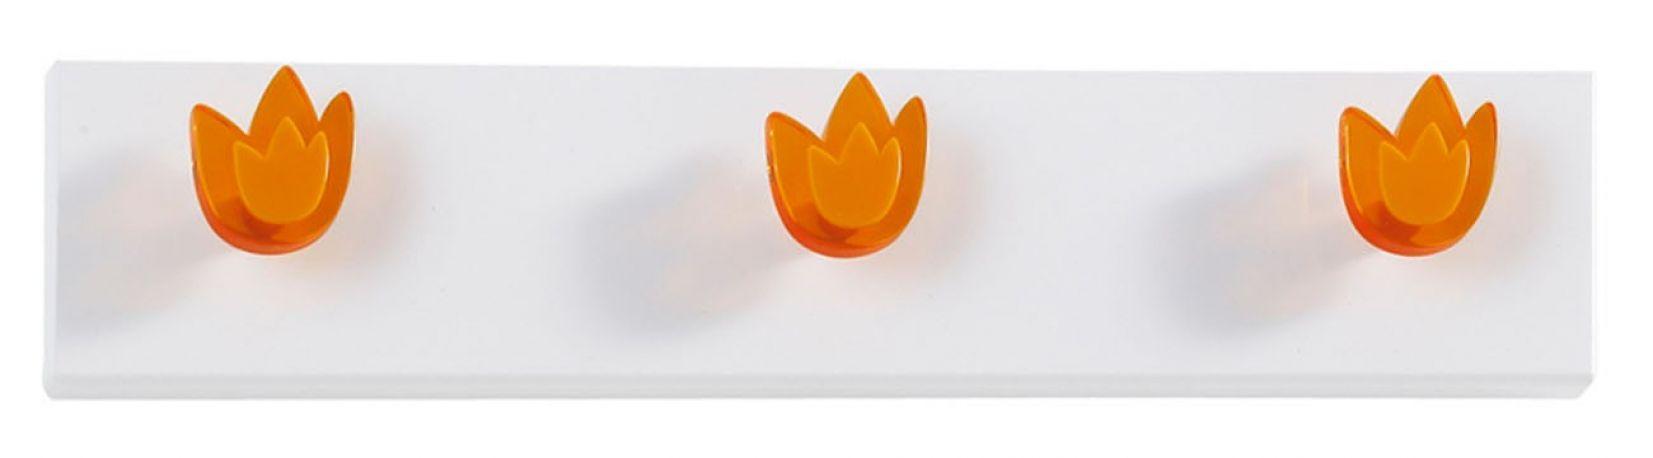 Perchero de pared Tulipanes de Dissery. Naranja